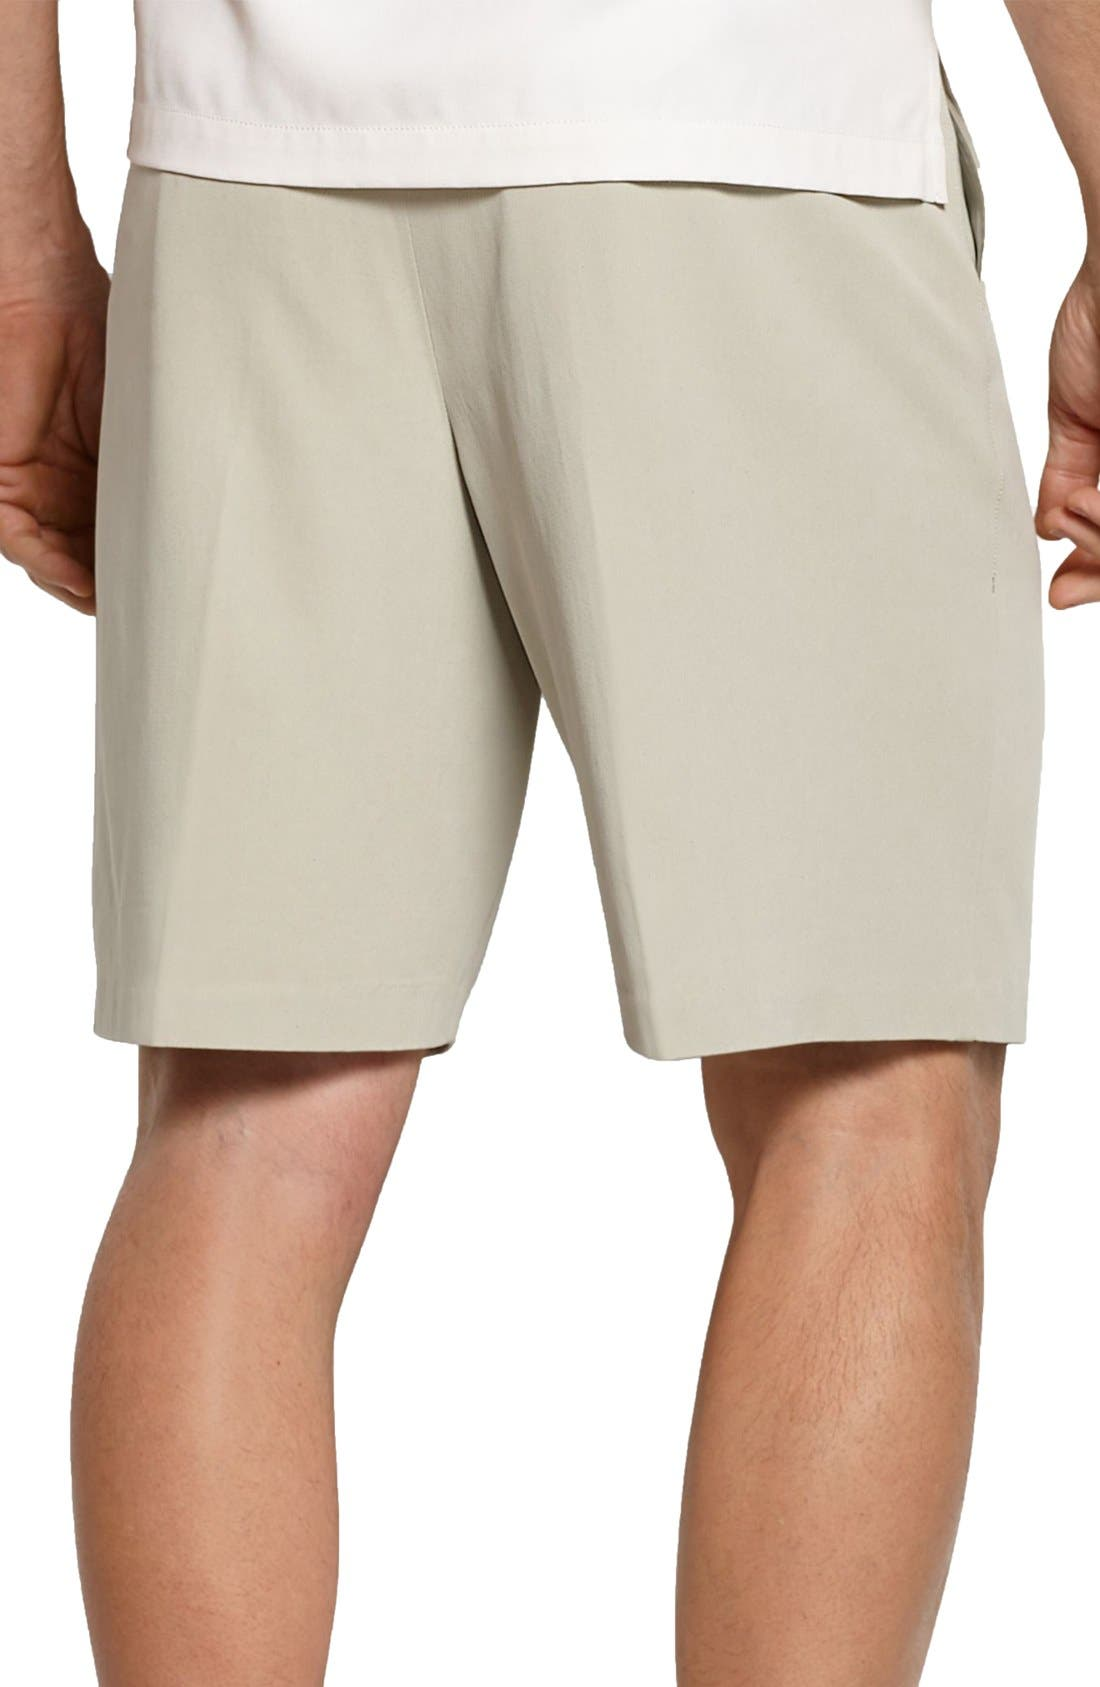 St. Thomas Pleated Shorts,                             Alternate thumbnail 2, color,                             Abbey Stone